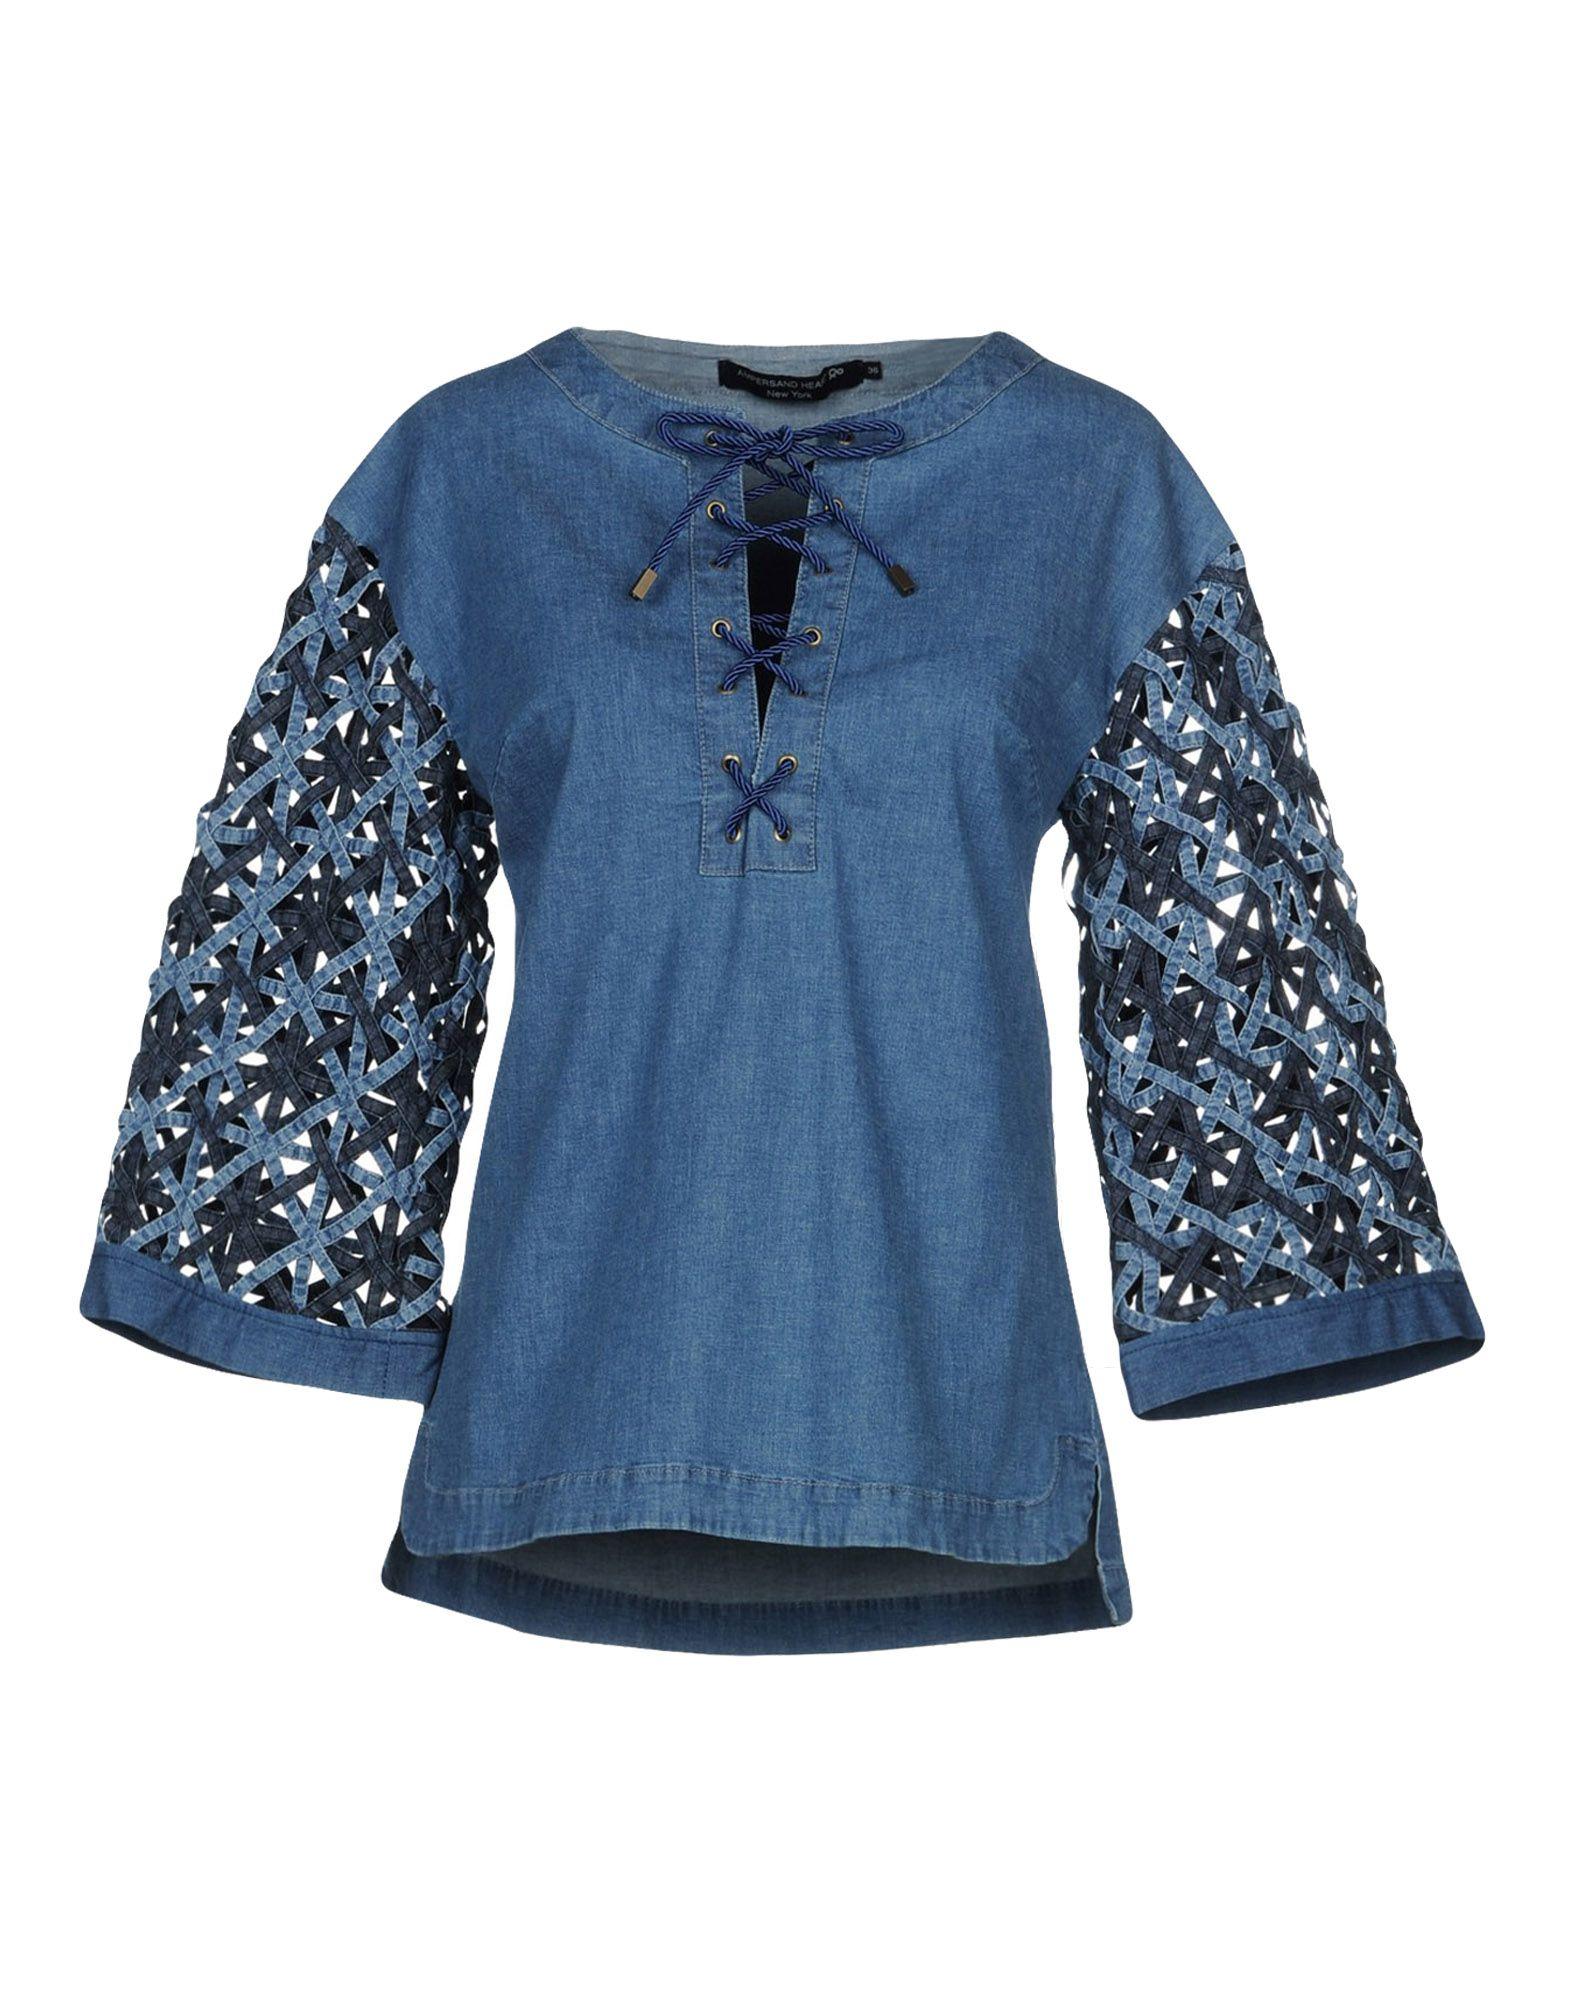 Camicia Jeans Ampersand Heart New York Donna - Acquista online su z0IlTF9X